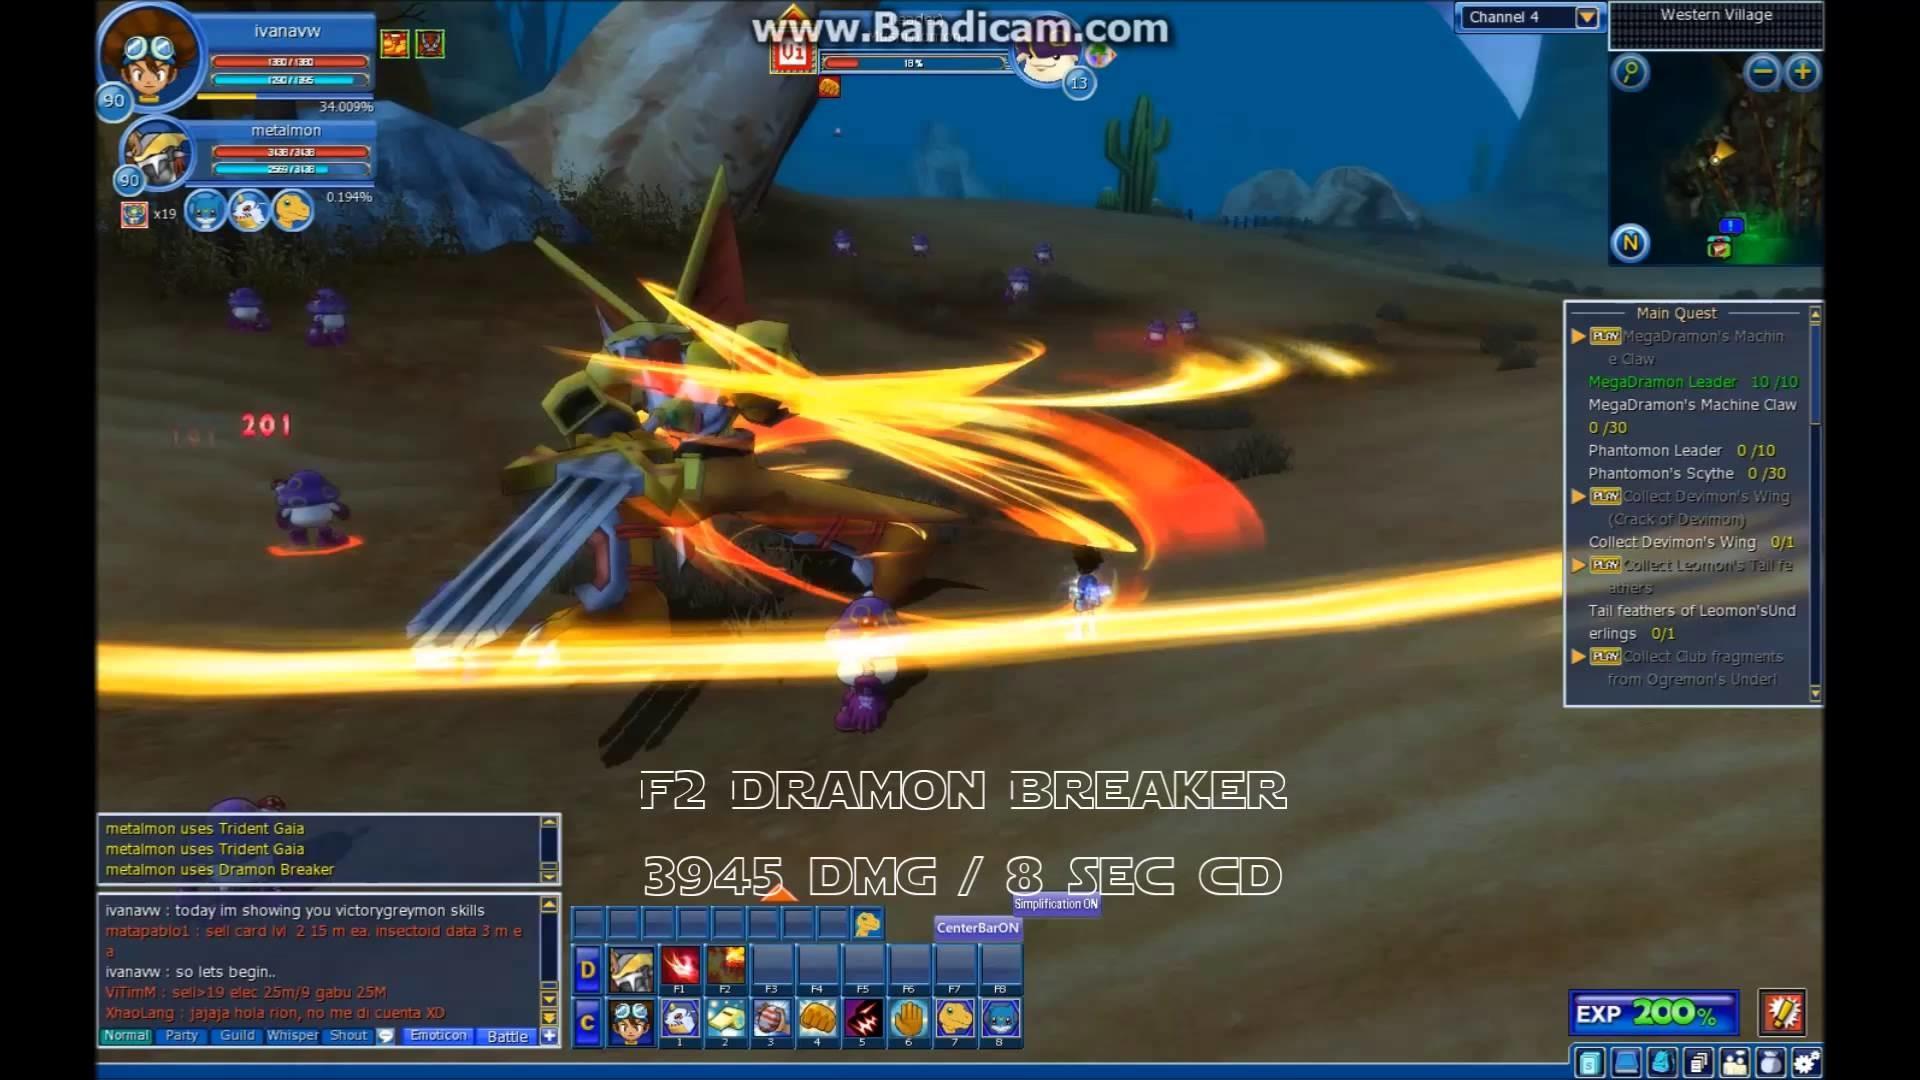 Res: 1920x1080, (GDMO)Victory Greymon skills (Agumon side mega) at 12/12 HD